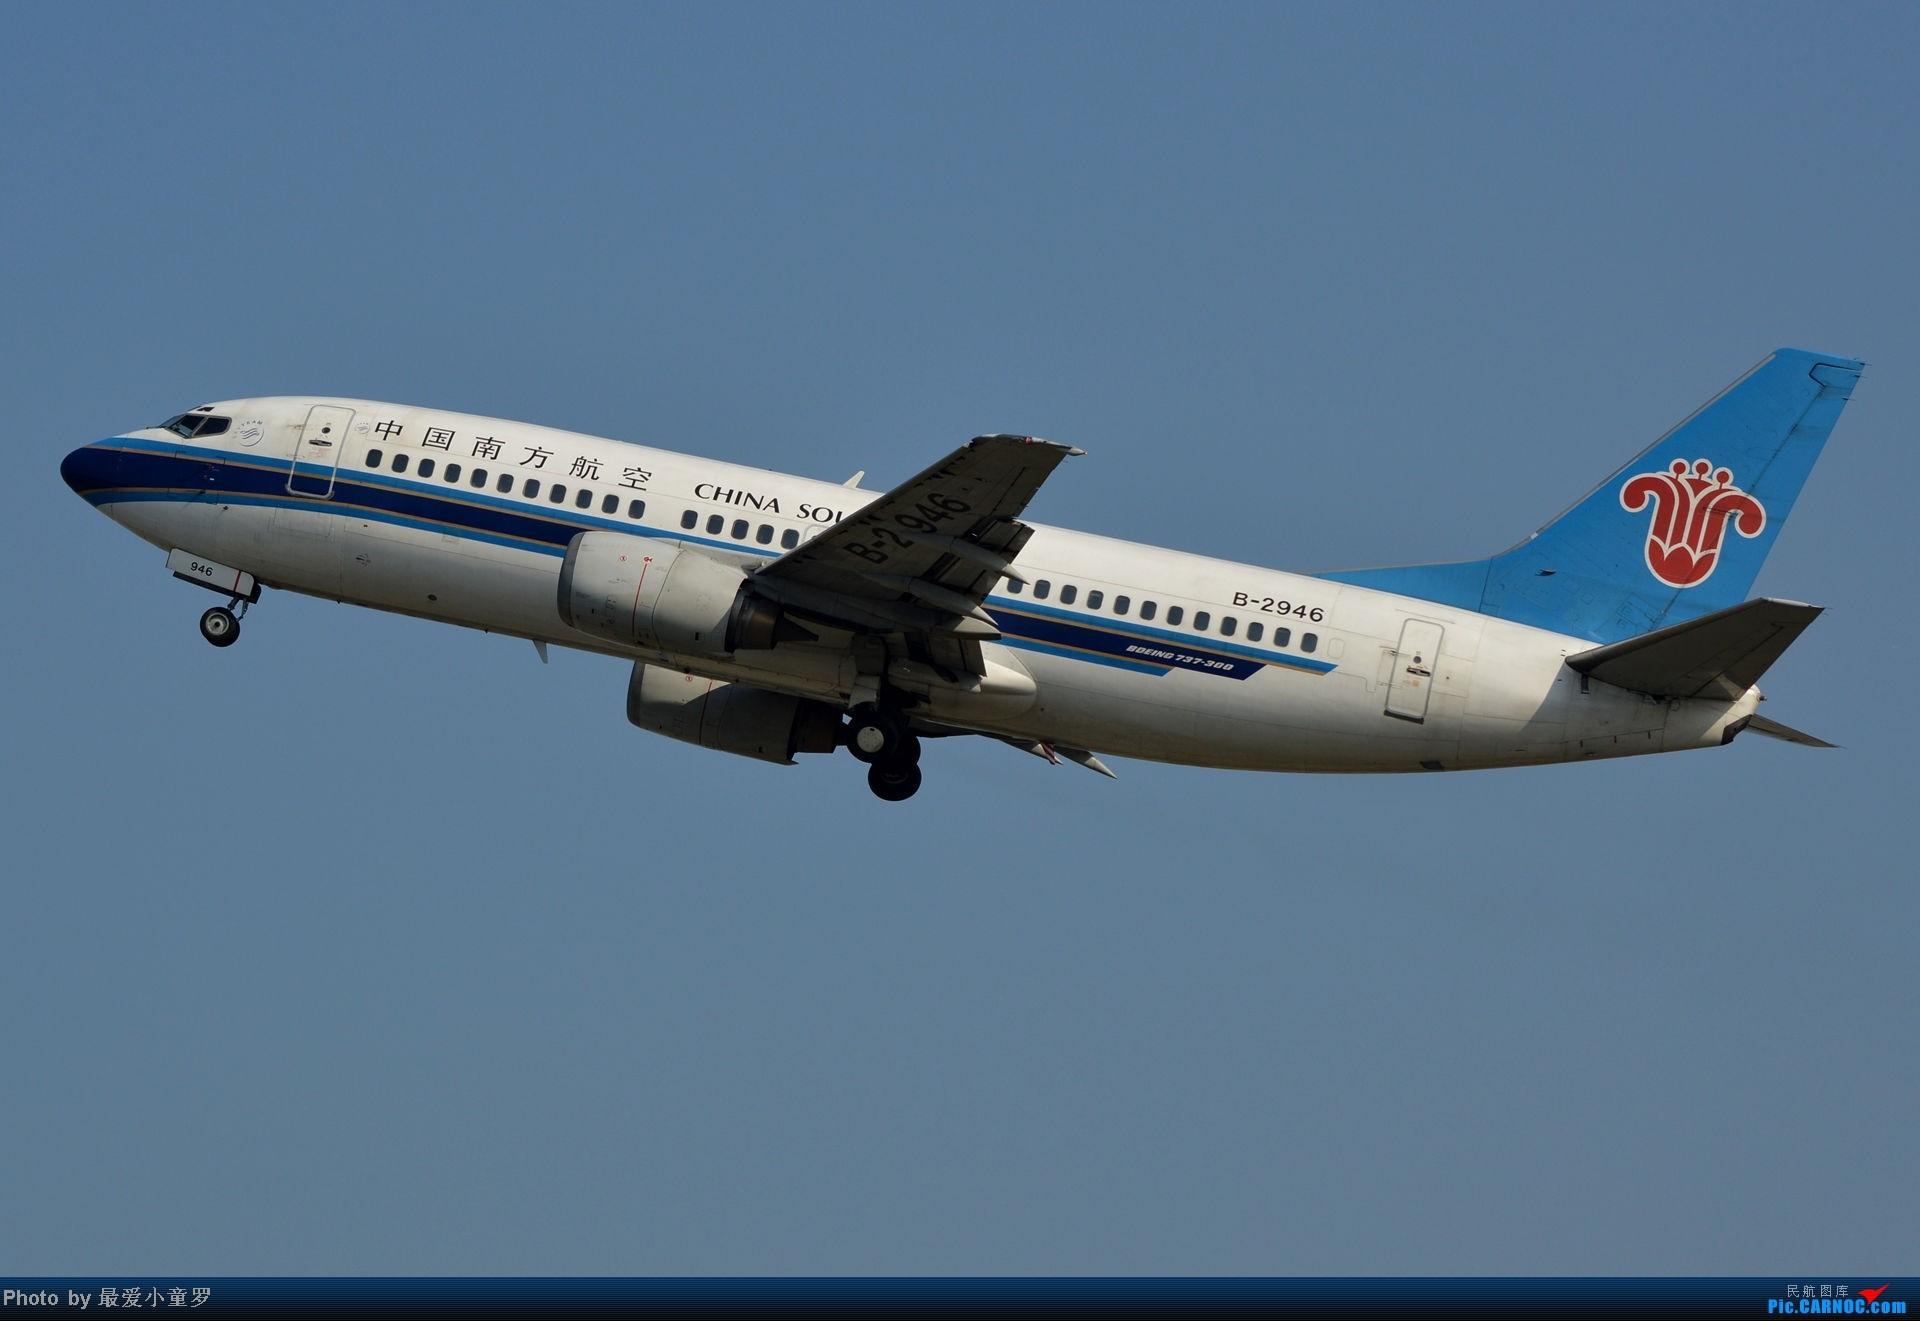 Re:[原创]老图系列,13年11月15日广州白云机场西跑拍机 BOEING 737-300 B-2946 中国广州白云机场